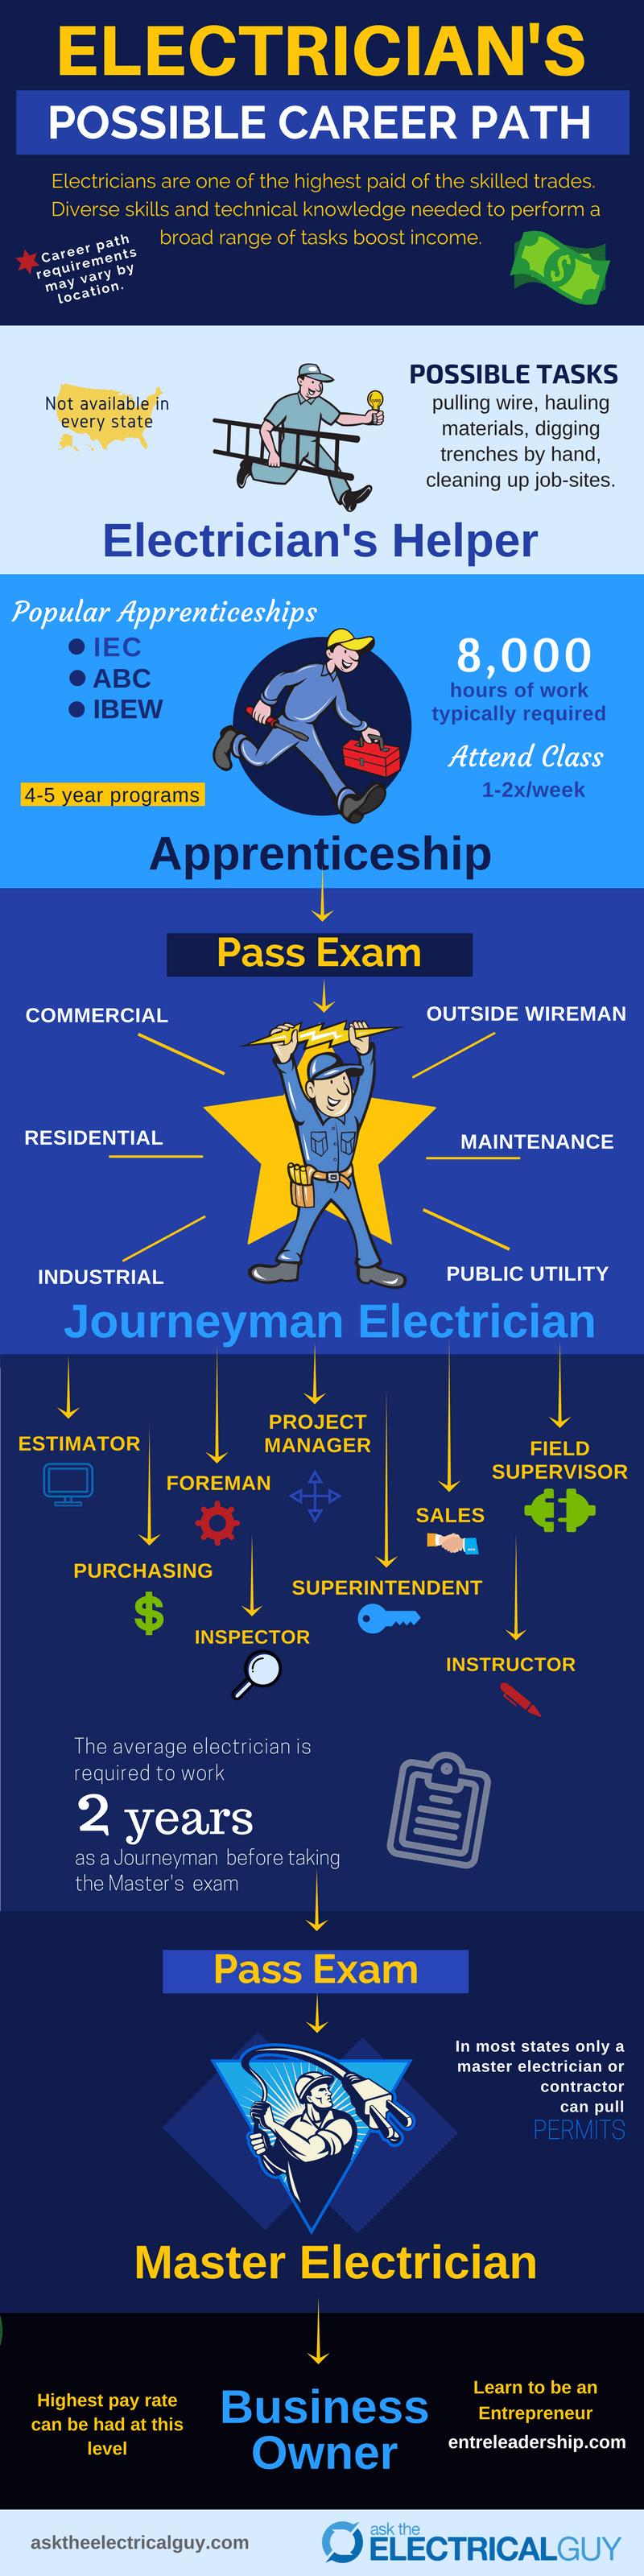 Electrician Career Path